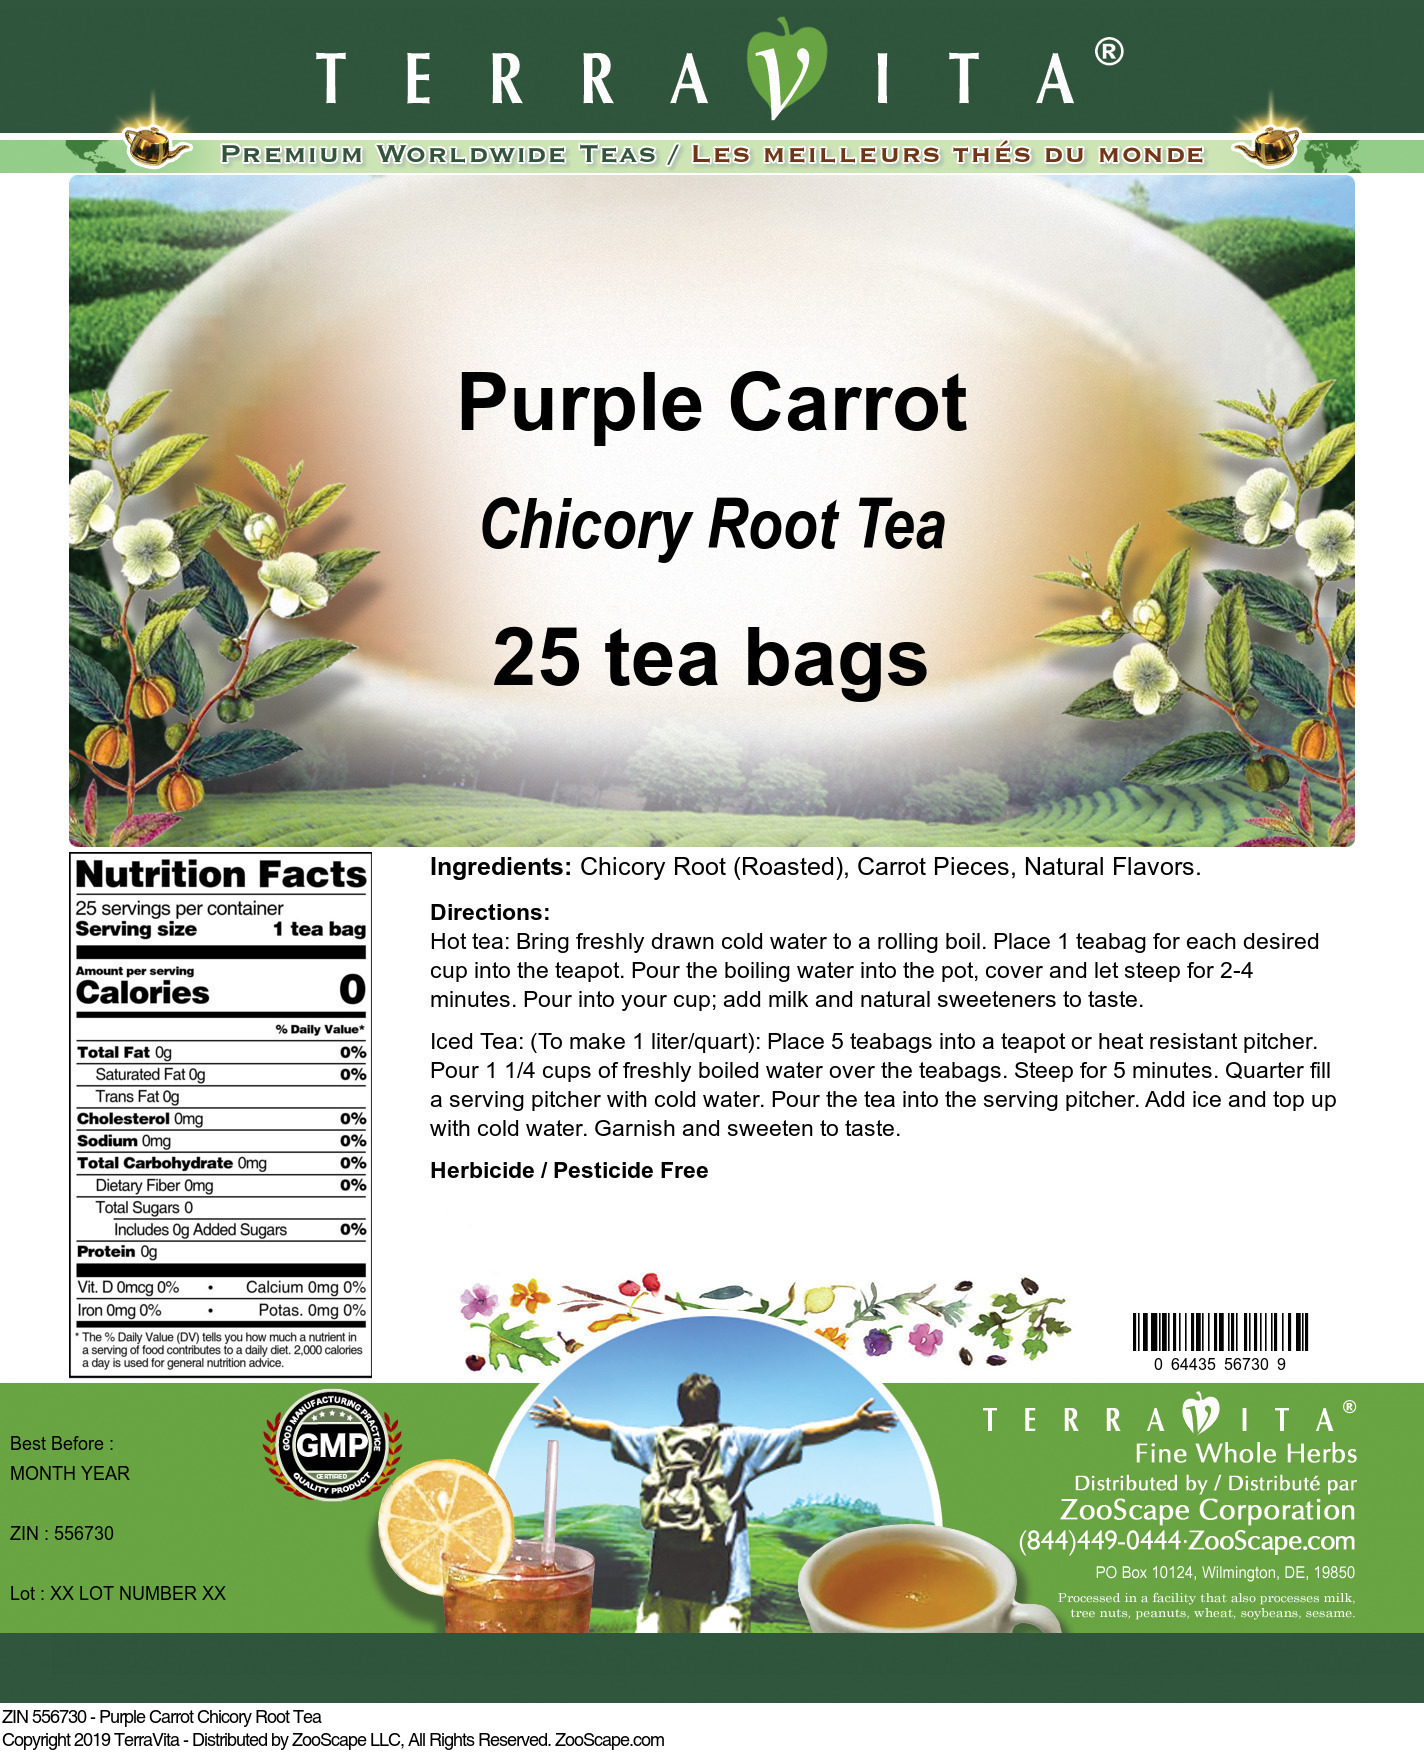 Purple Carrot Chicory Root Tea